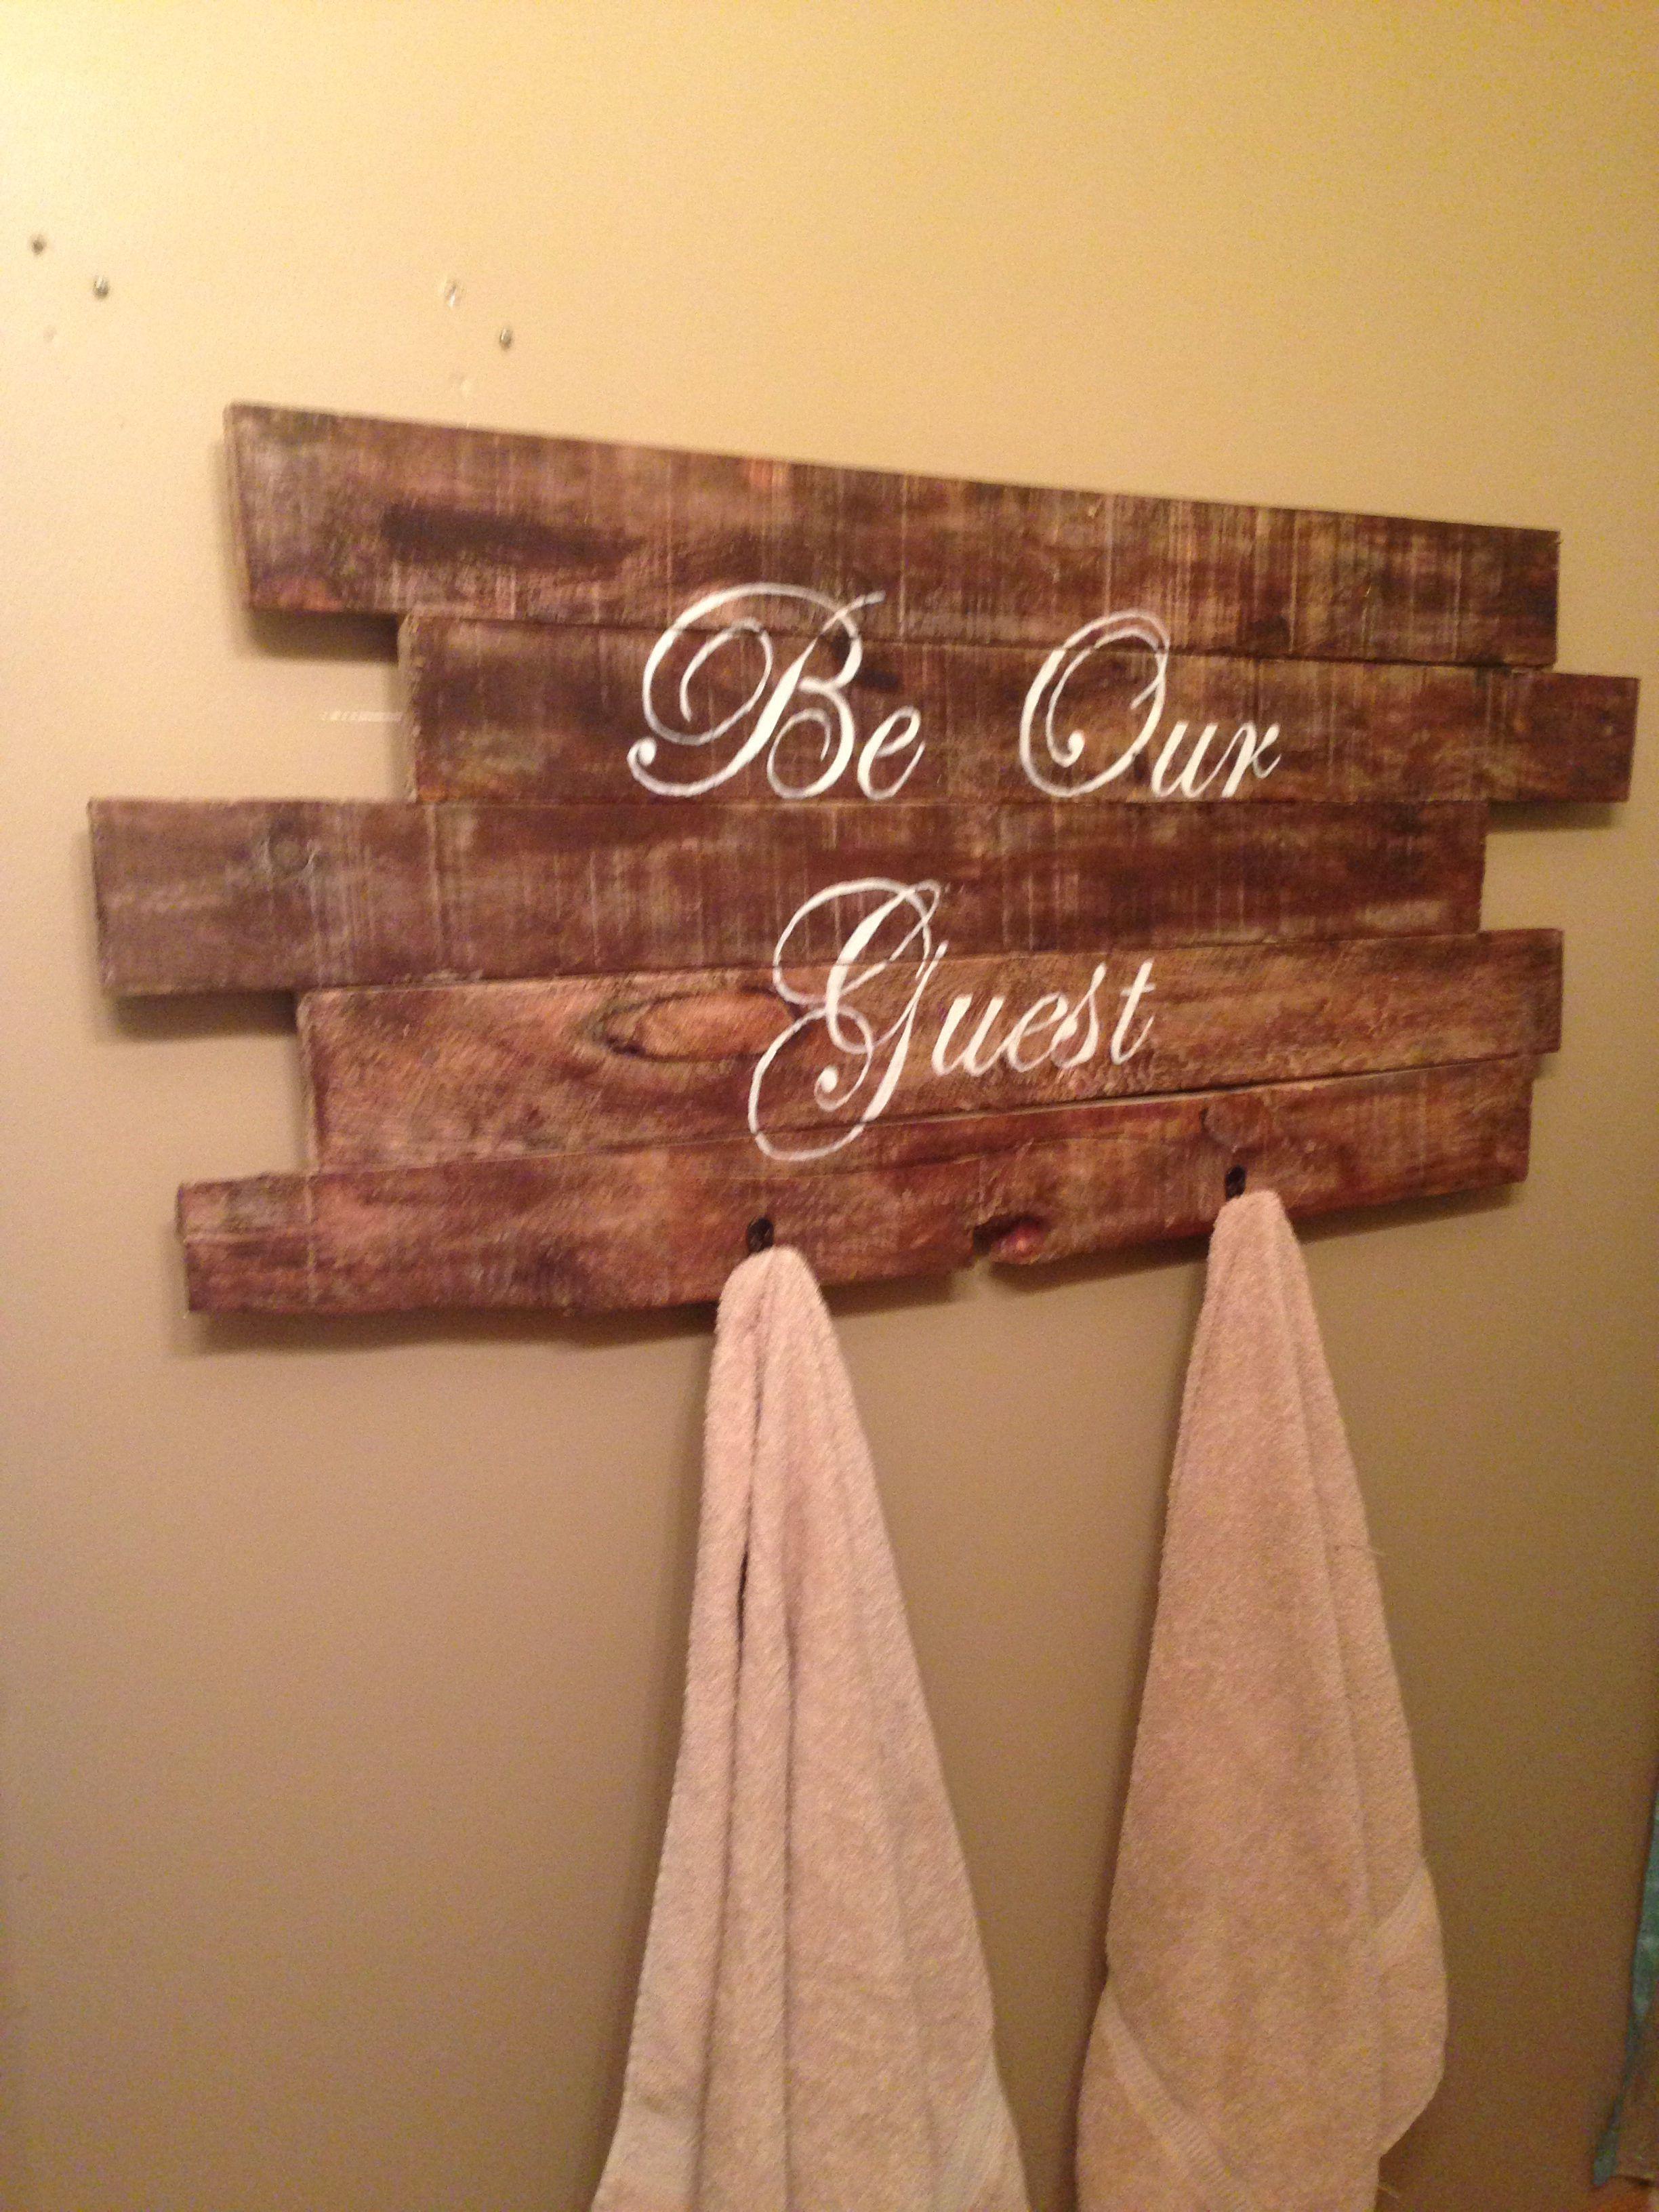 Guest bathroom signtowel rack made from pallet wood